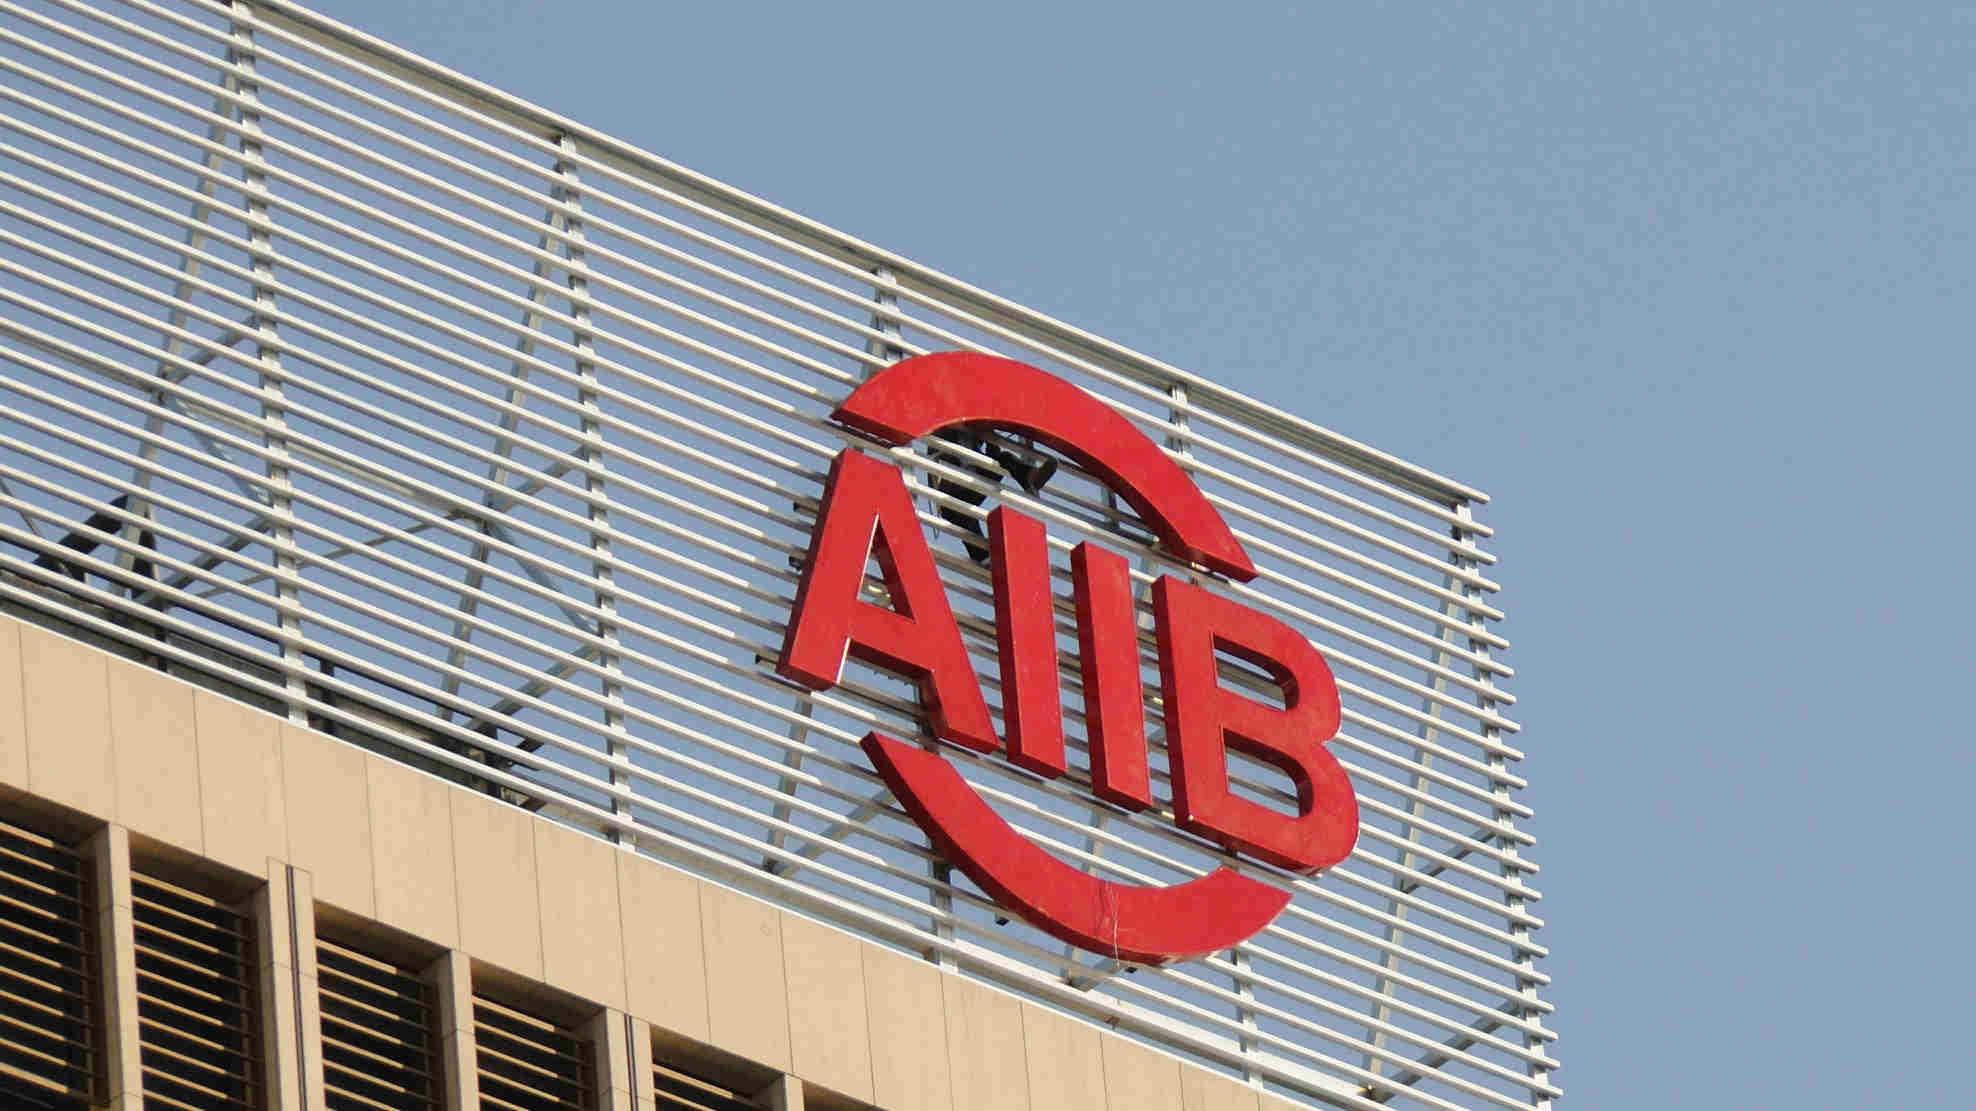 Sri Lanka begins AIIB-financed construction of 700 public housing units